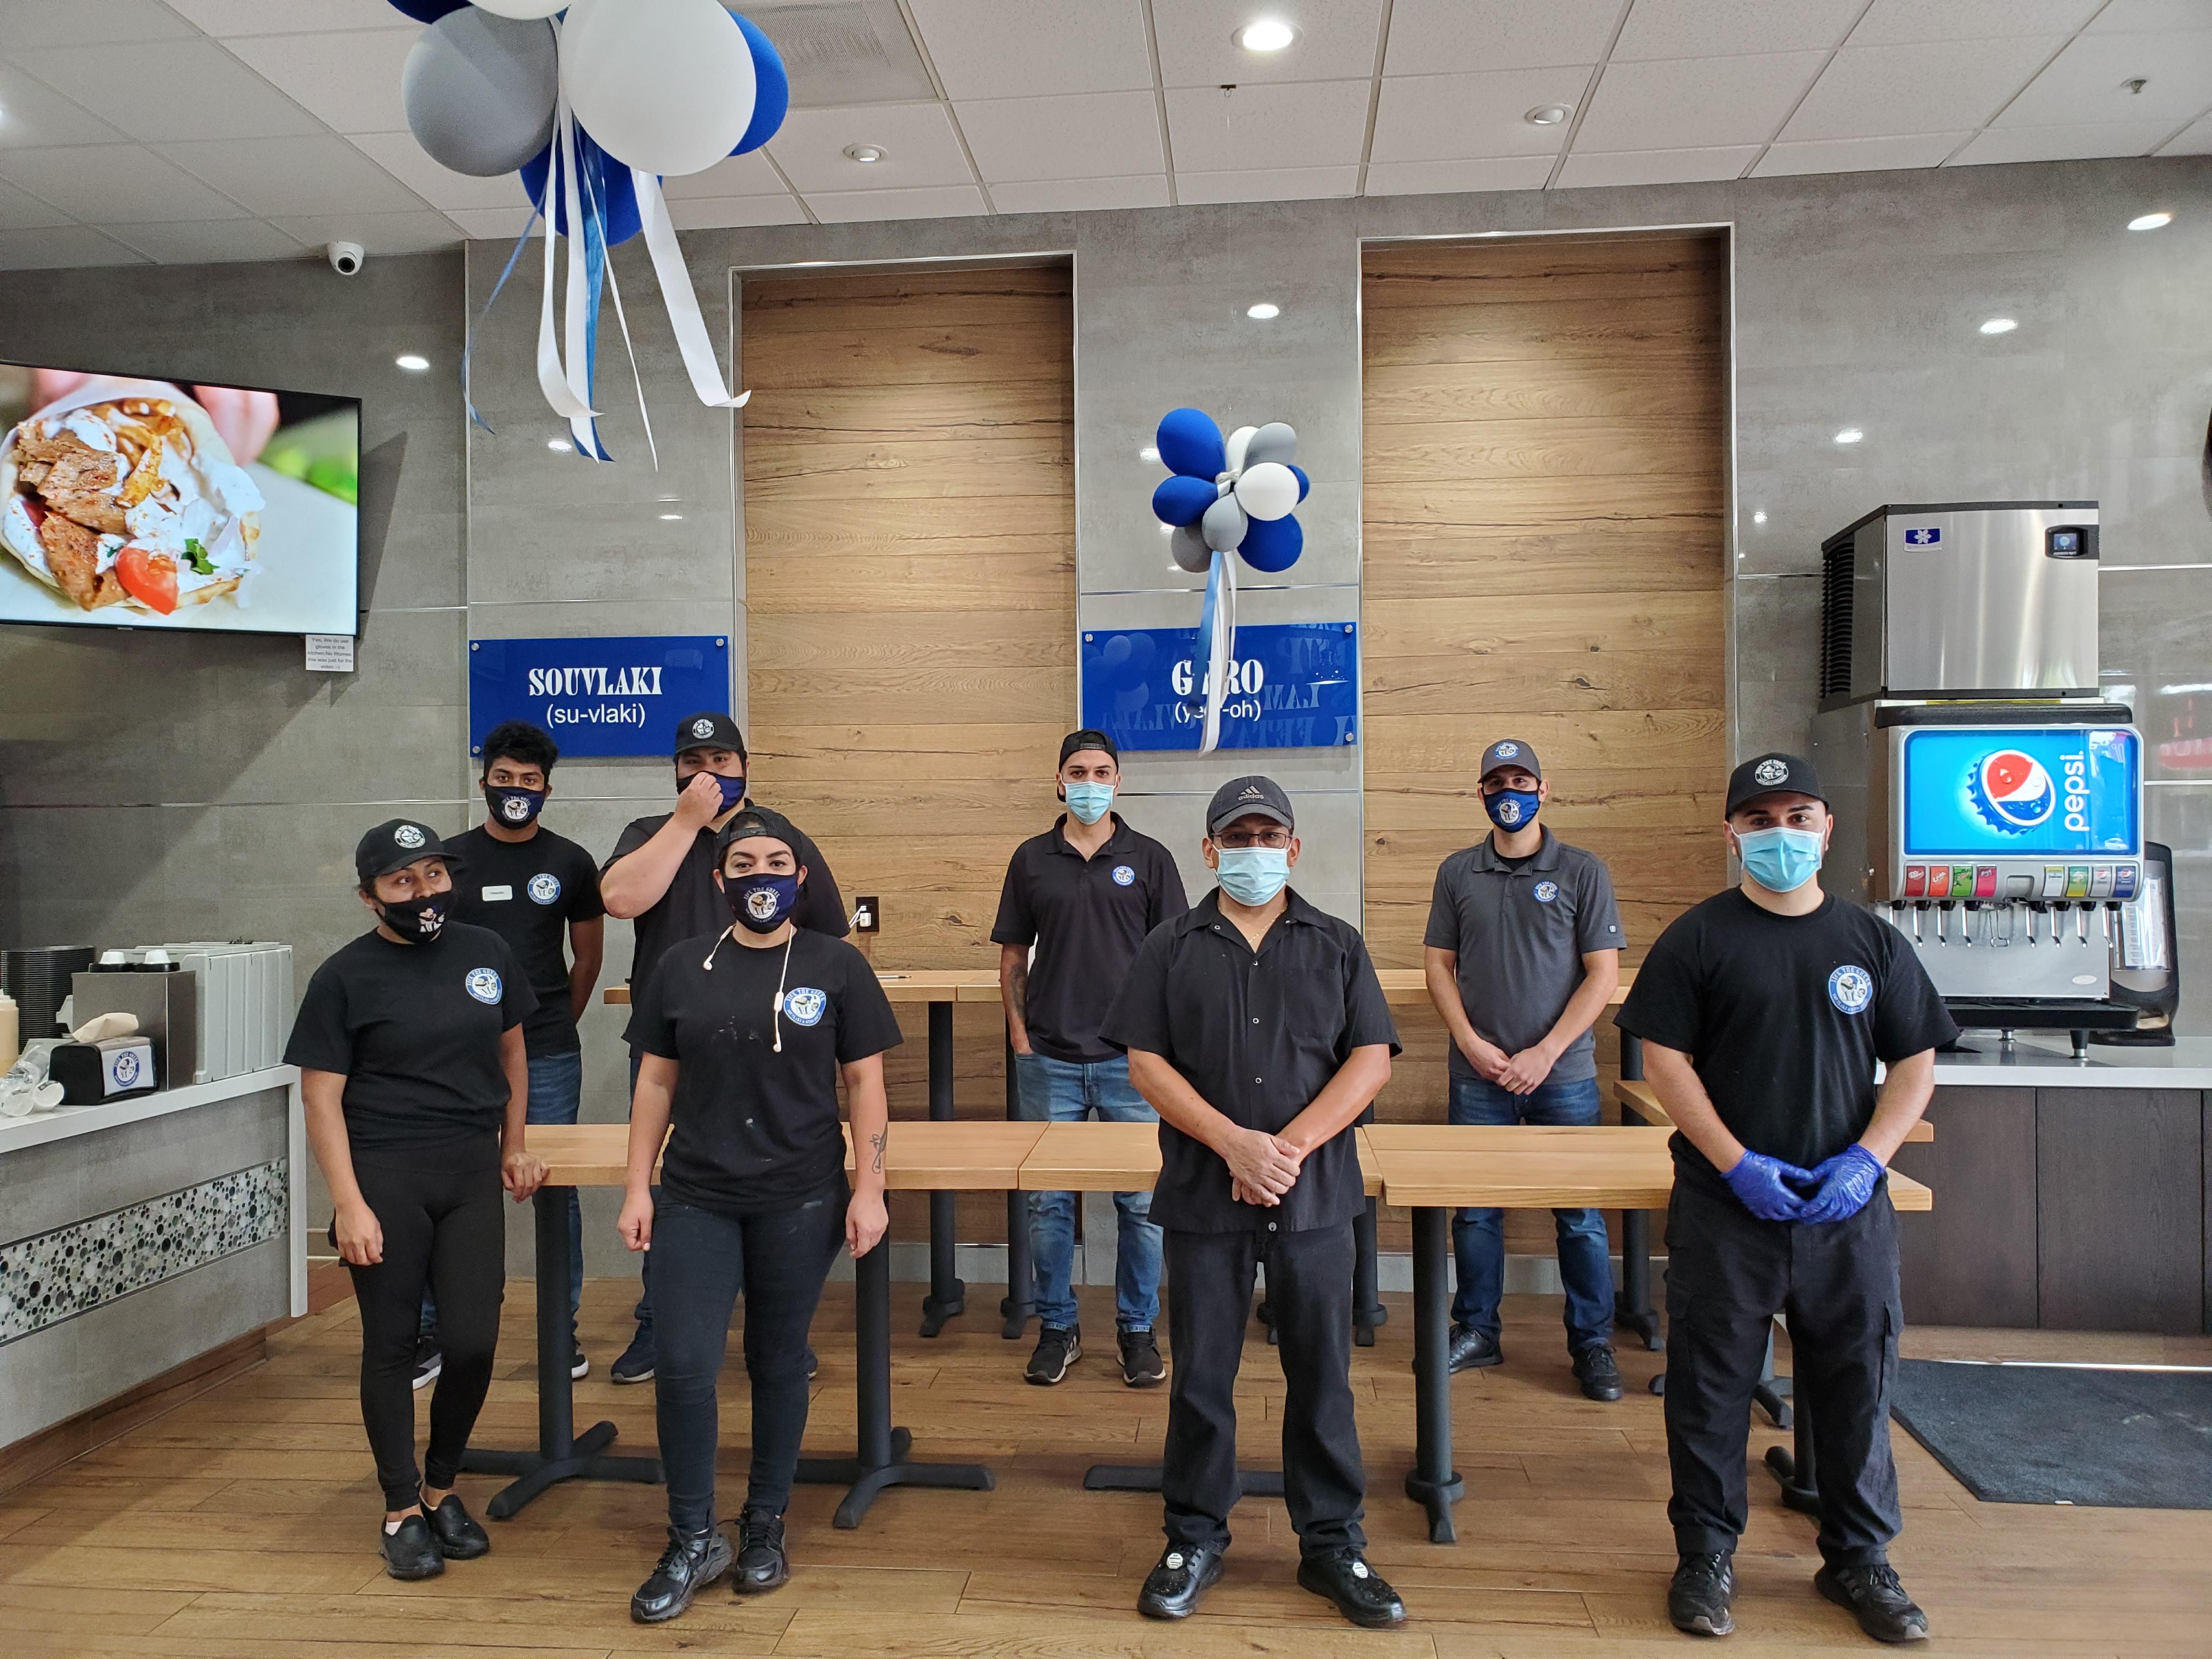 restaurant workers wearing masks